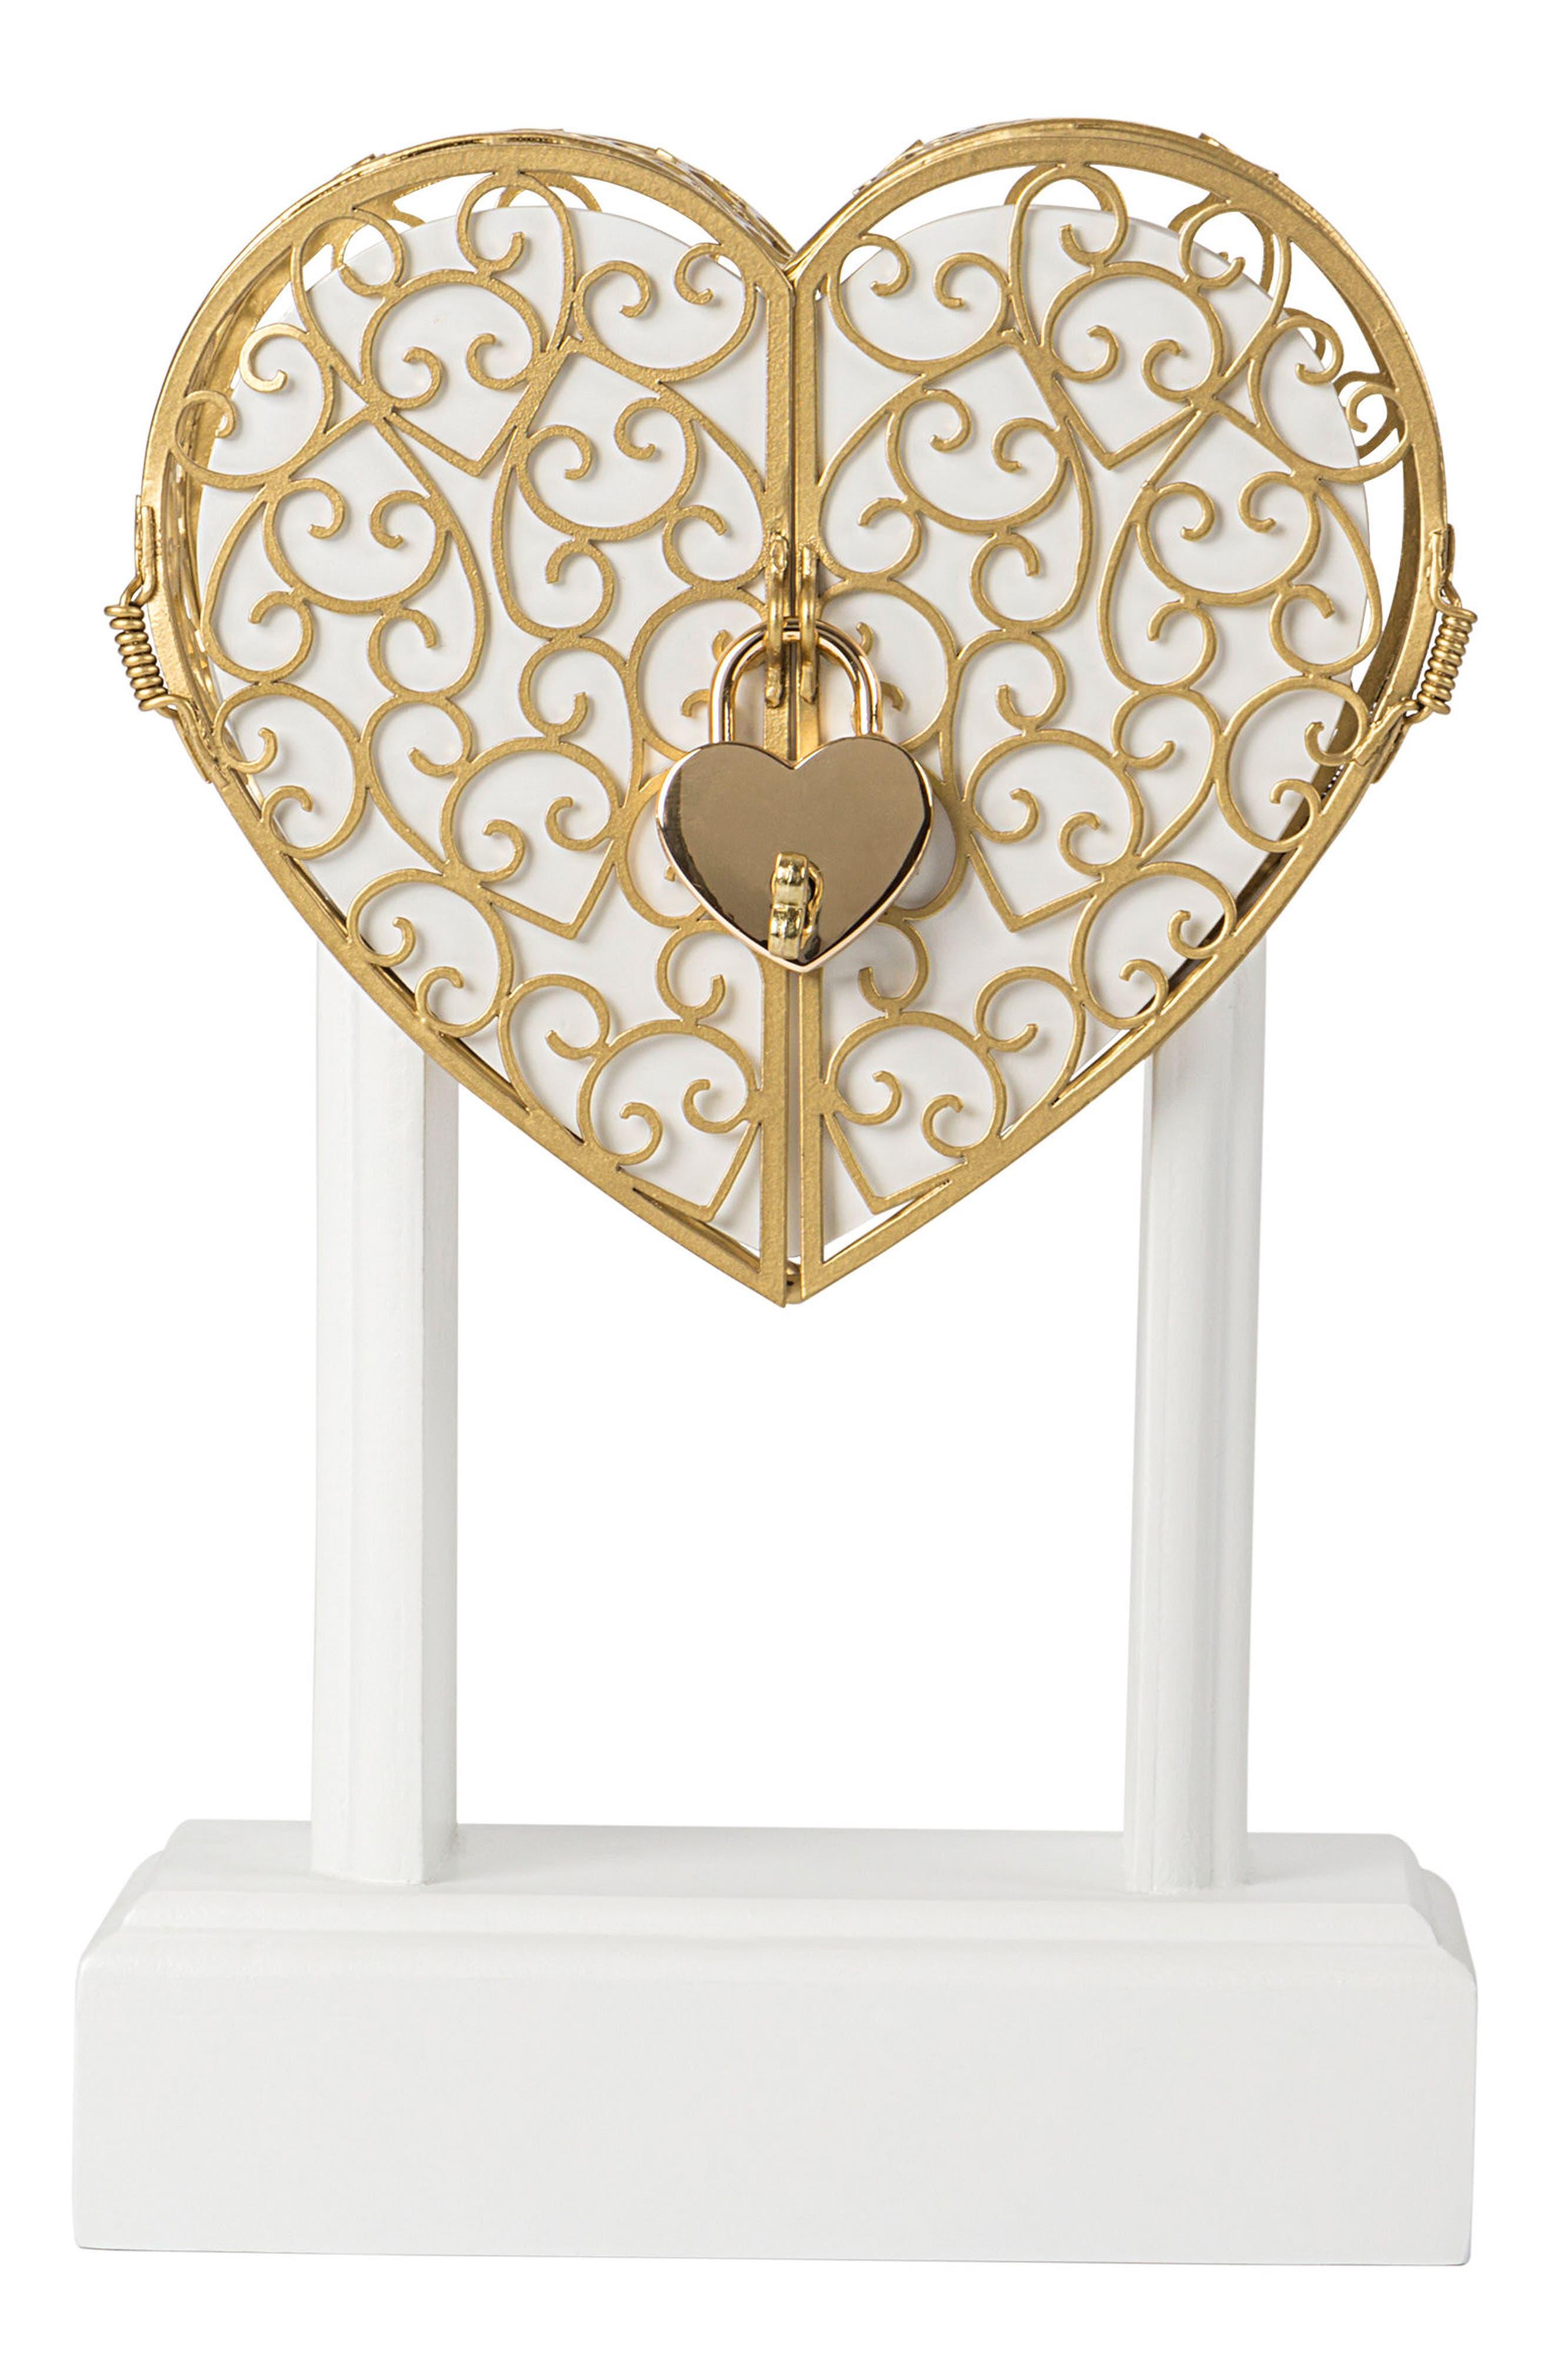 Cathy's Concepts Key To My Heart Monogram Vow Unity Keepsake Box